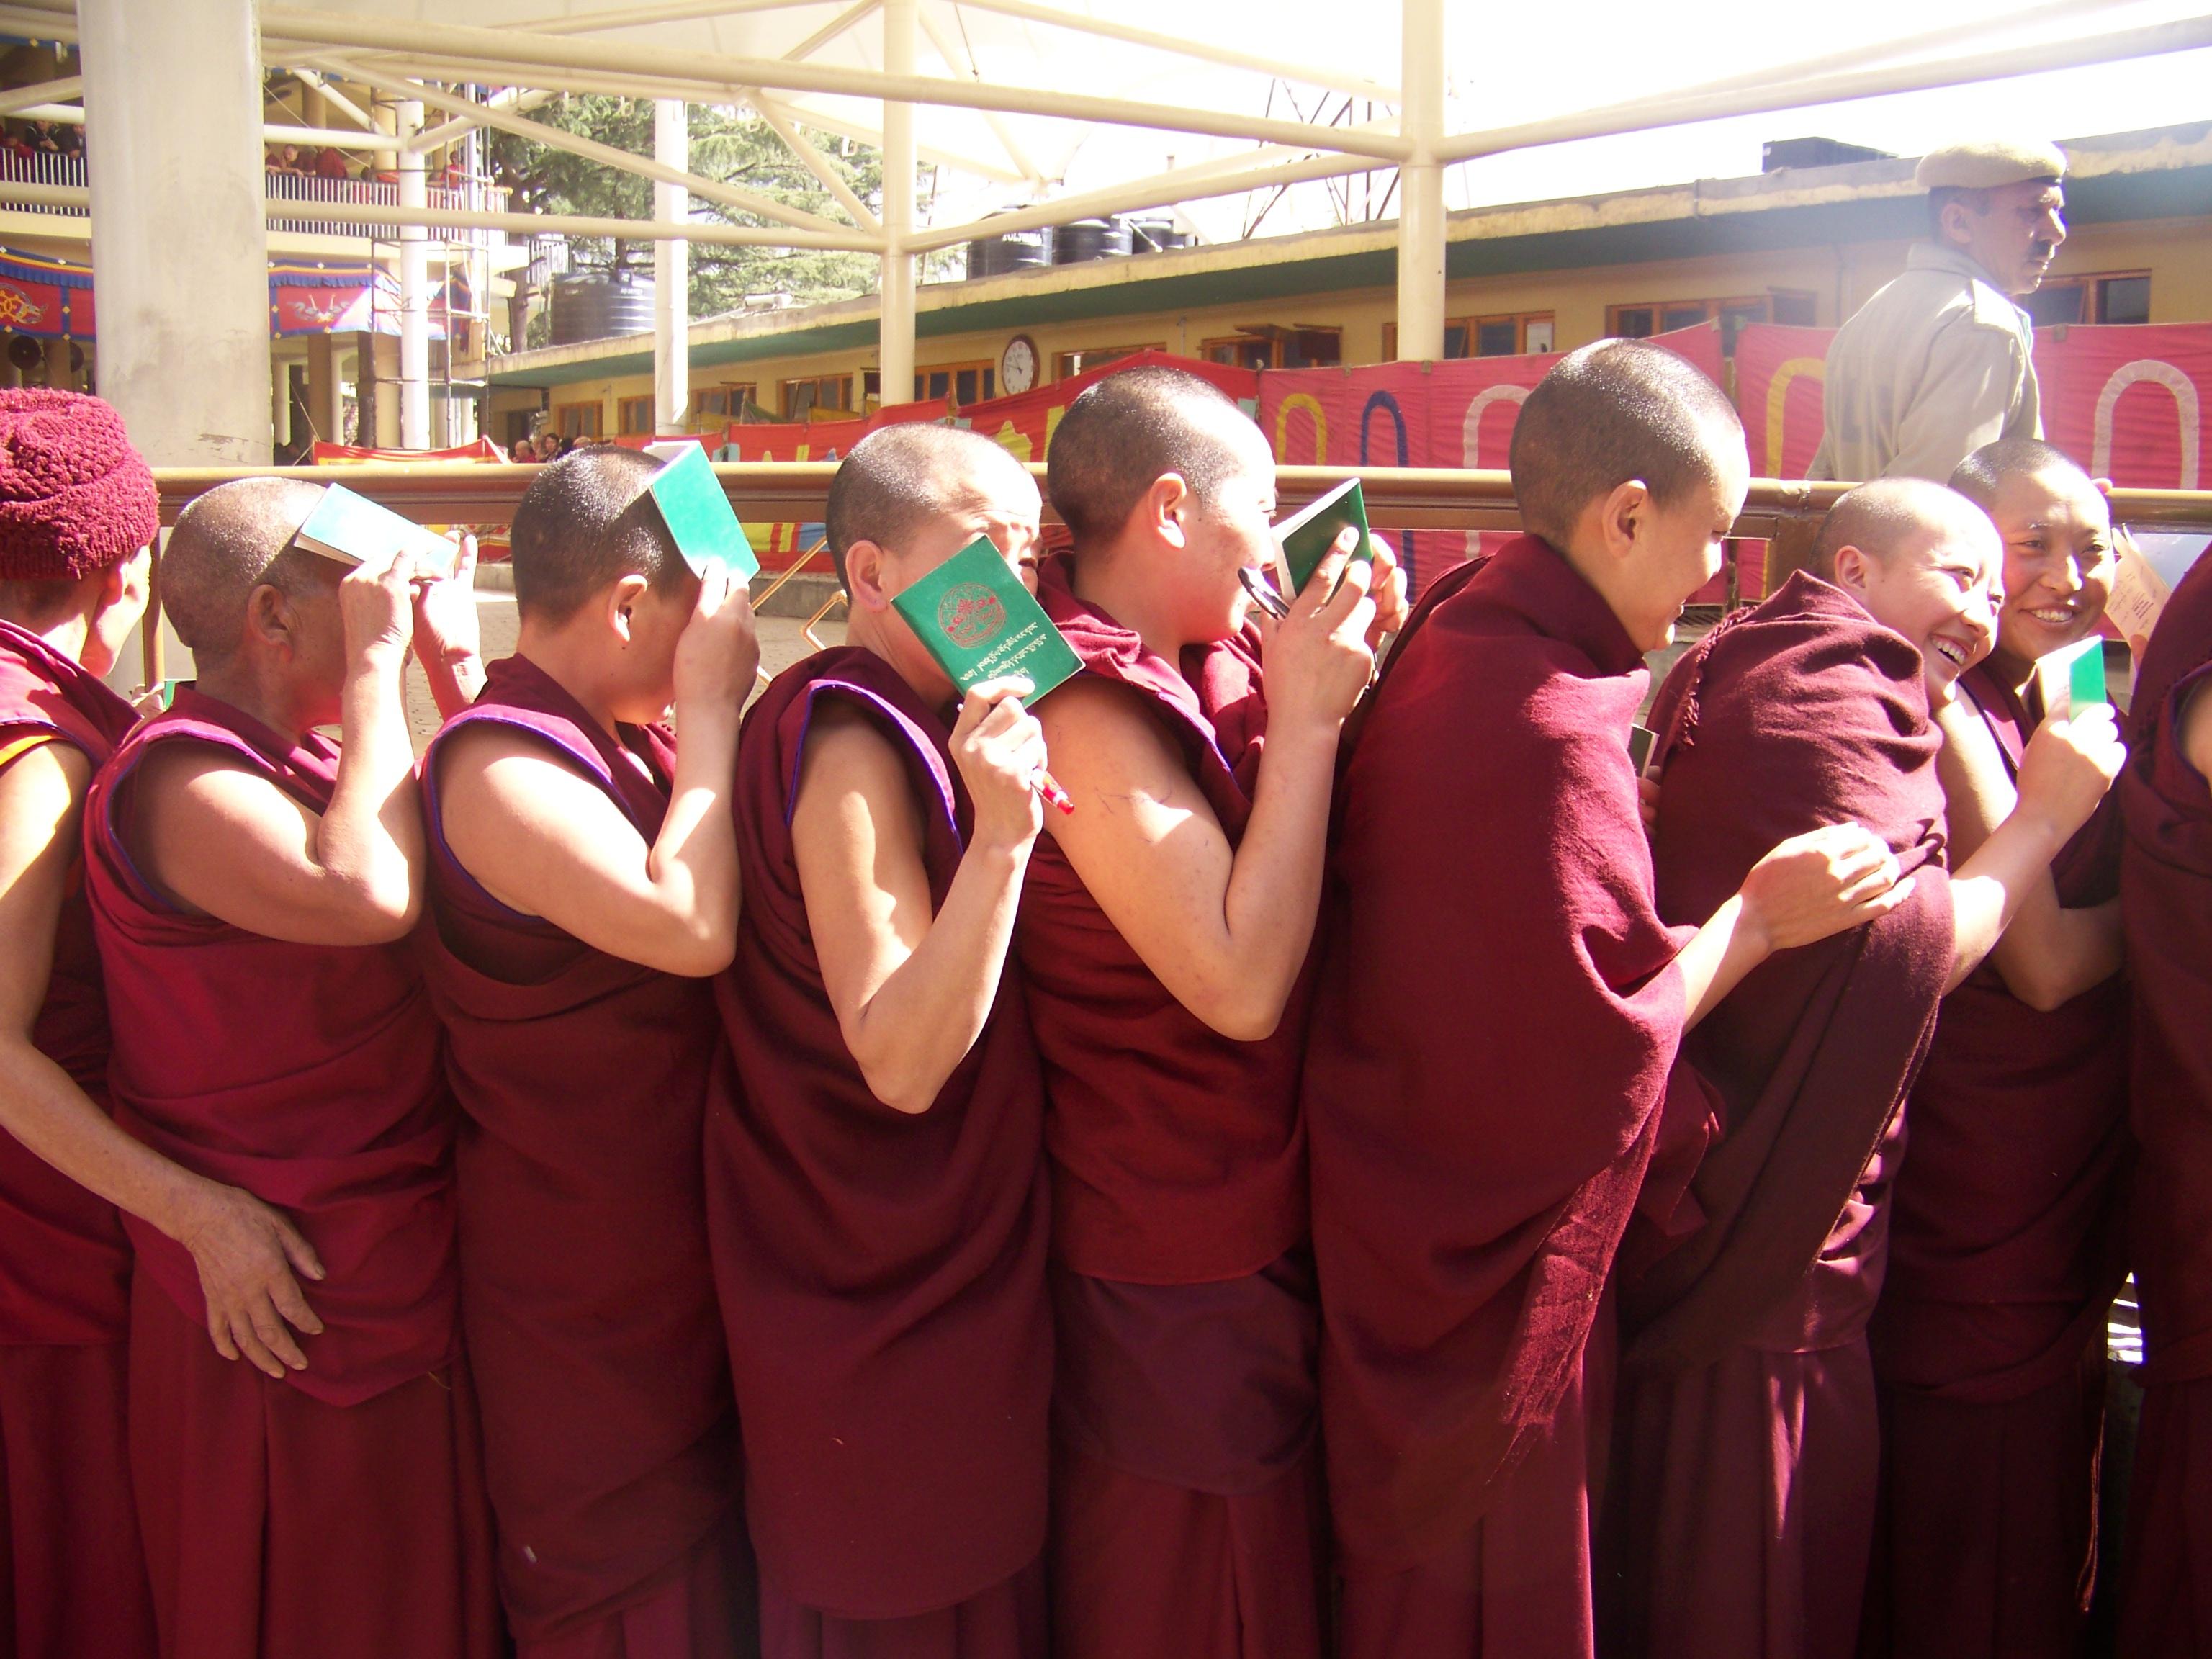 102_2268 Jonathan Machler, Tibétains à Dharamsala, Copyright